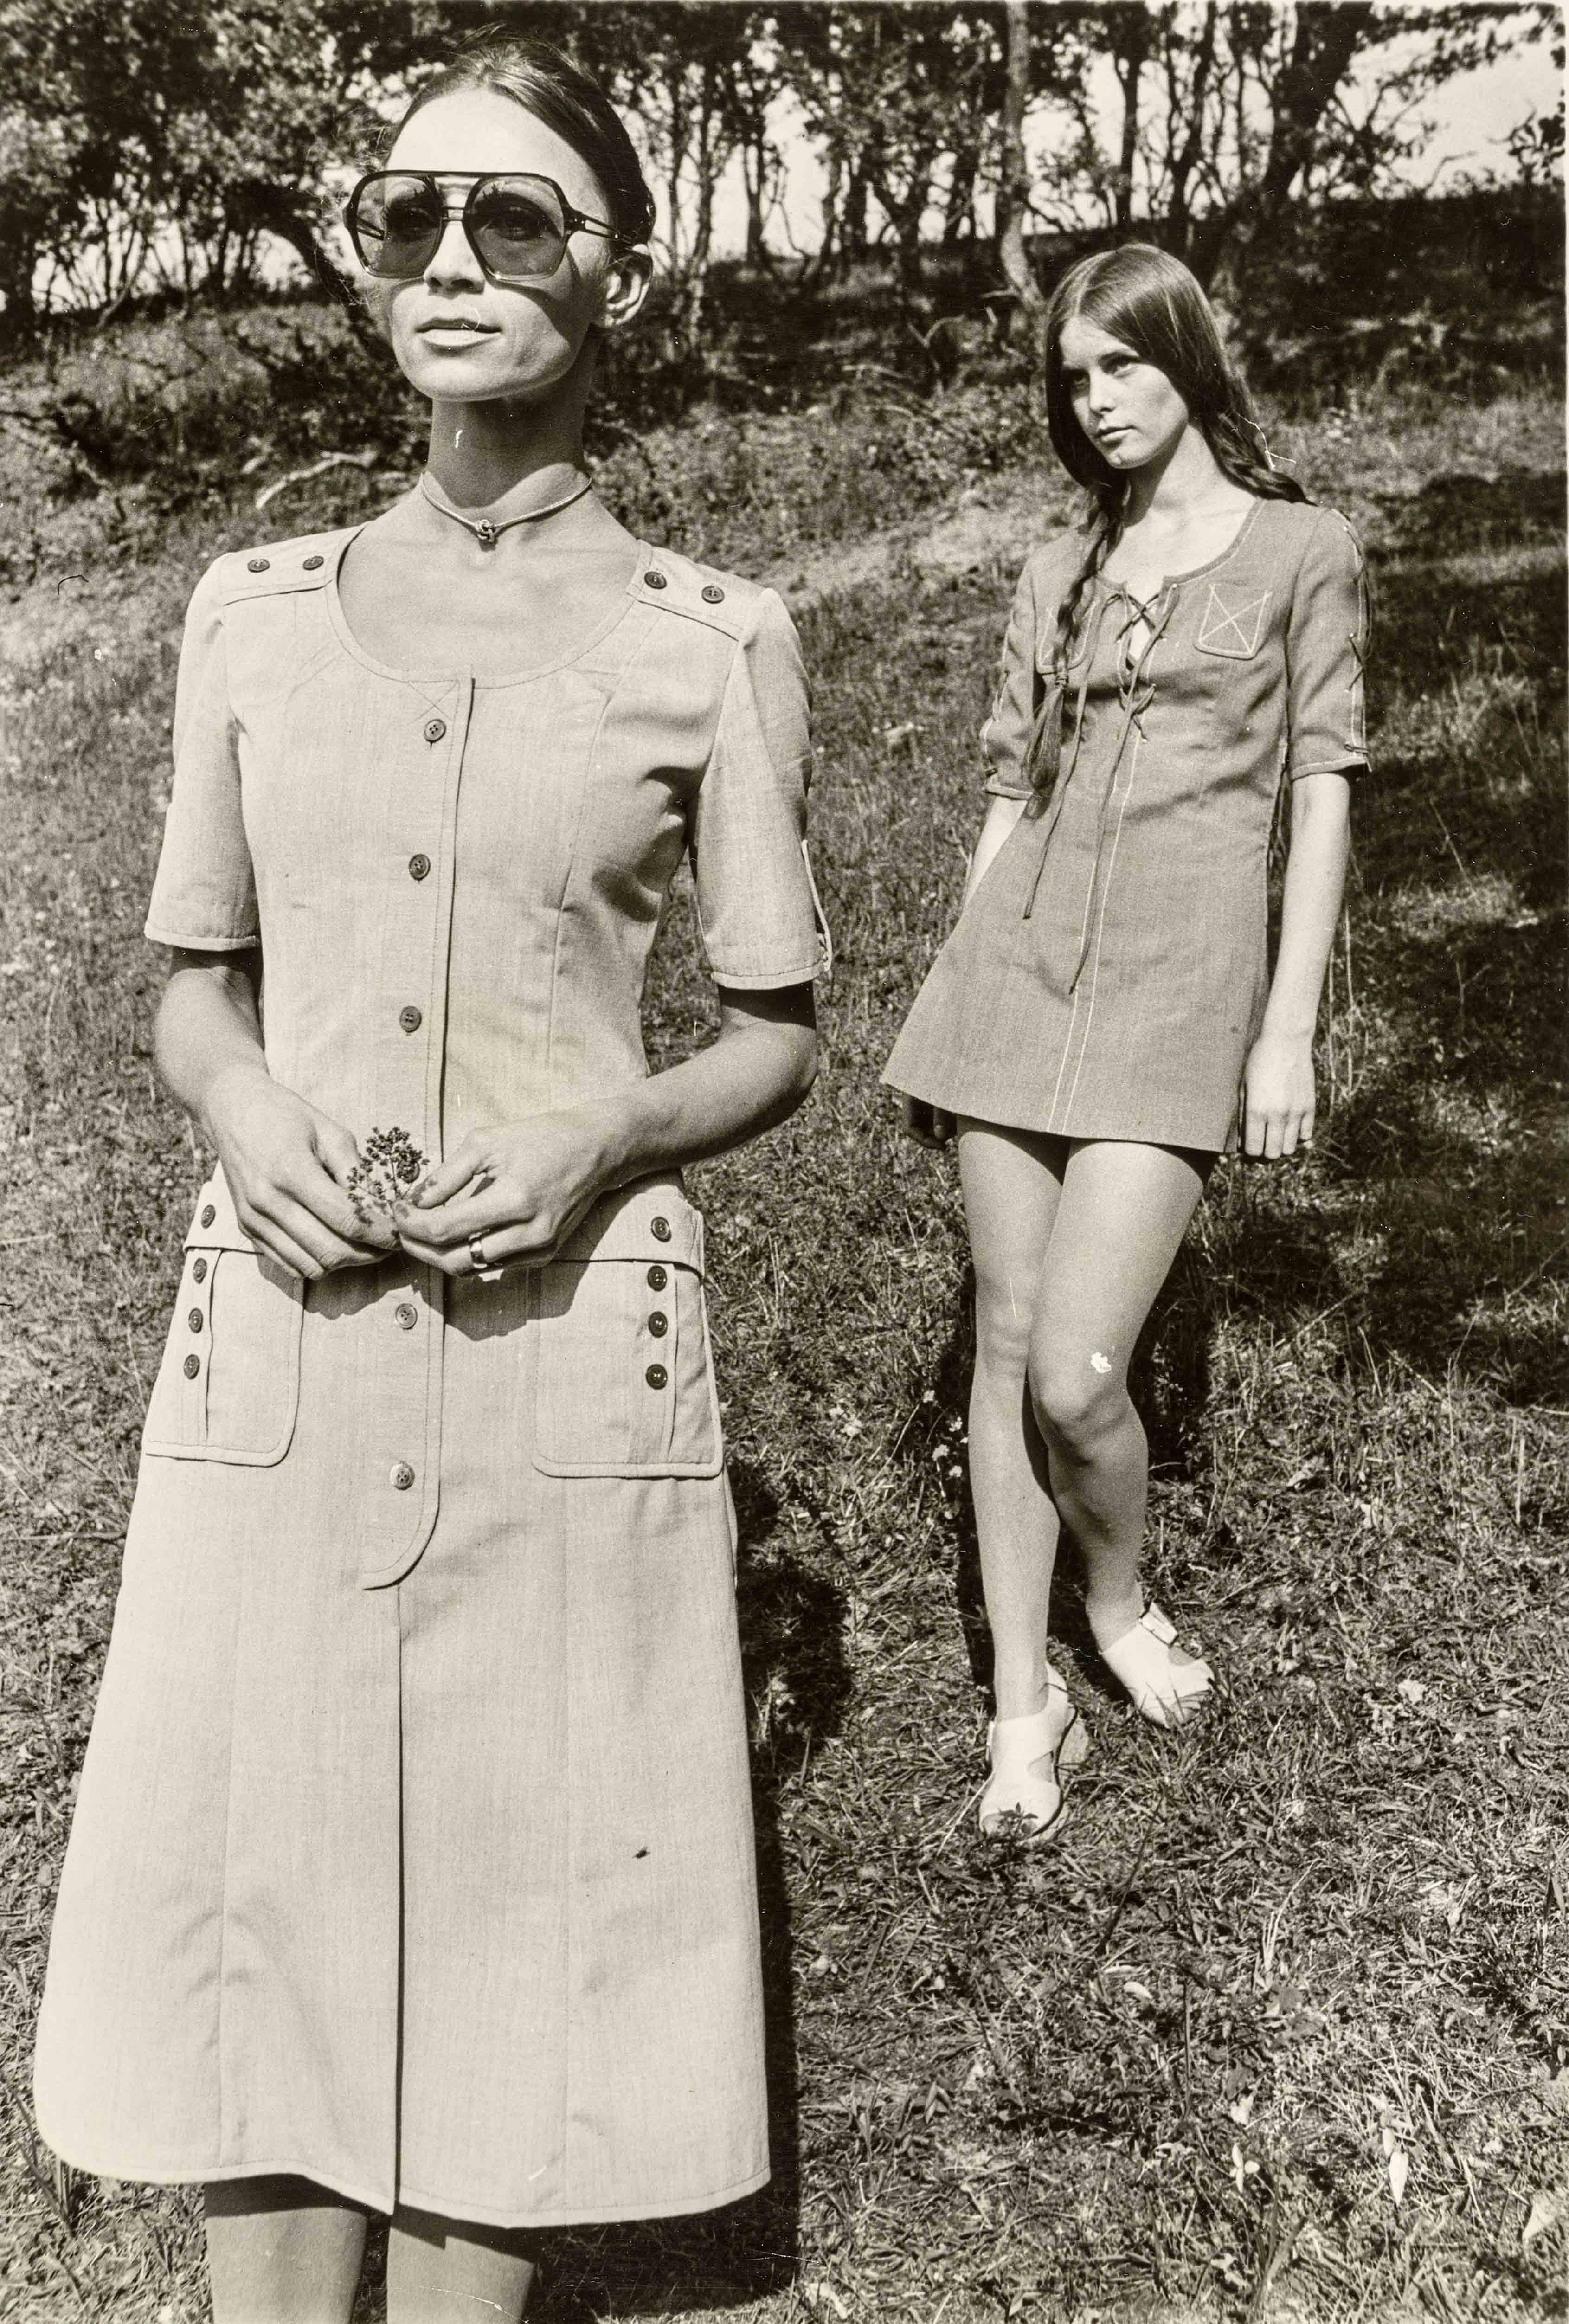 Summer dresses | vintage print | 15,7 x 11,8 in | design: Dorothee Brandt, production: PGH 'Eintracht' | 'Sibylle', issue 2, 1972 Galerie Berinson, Berlin